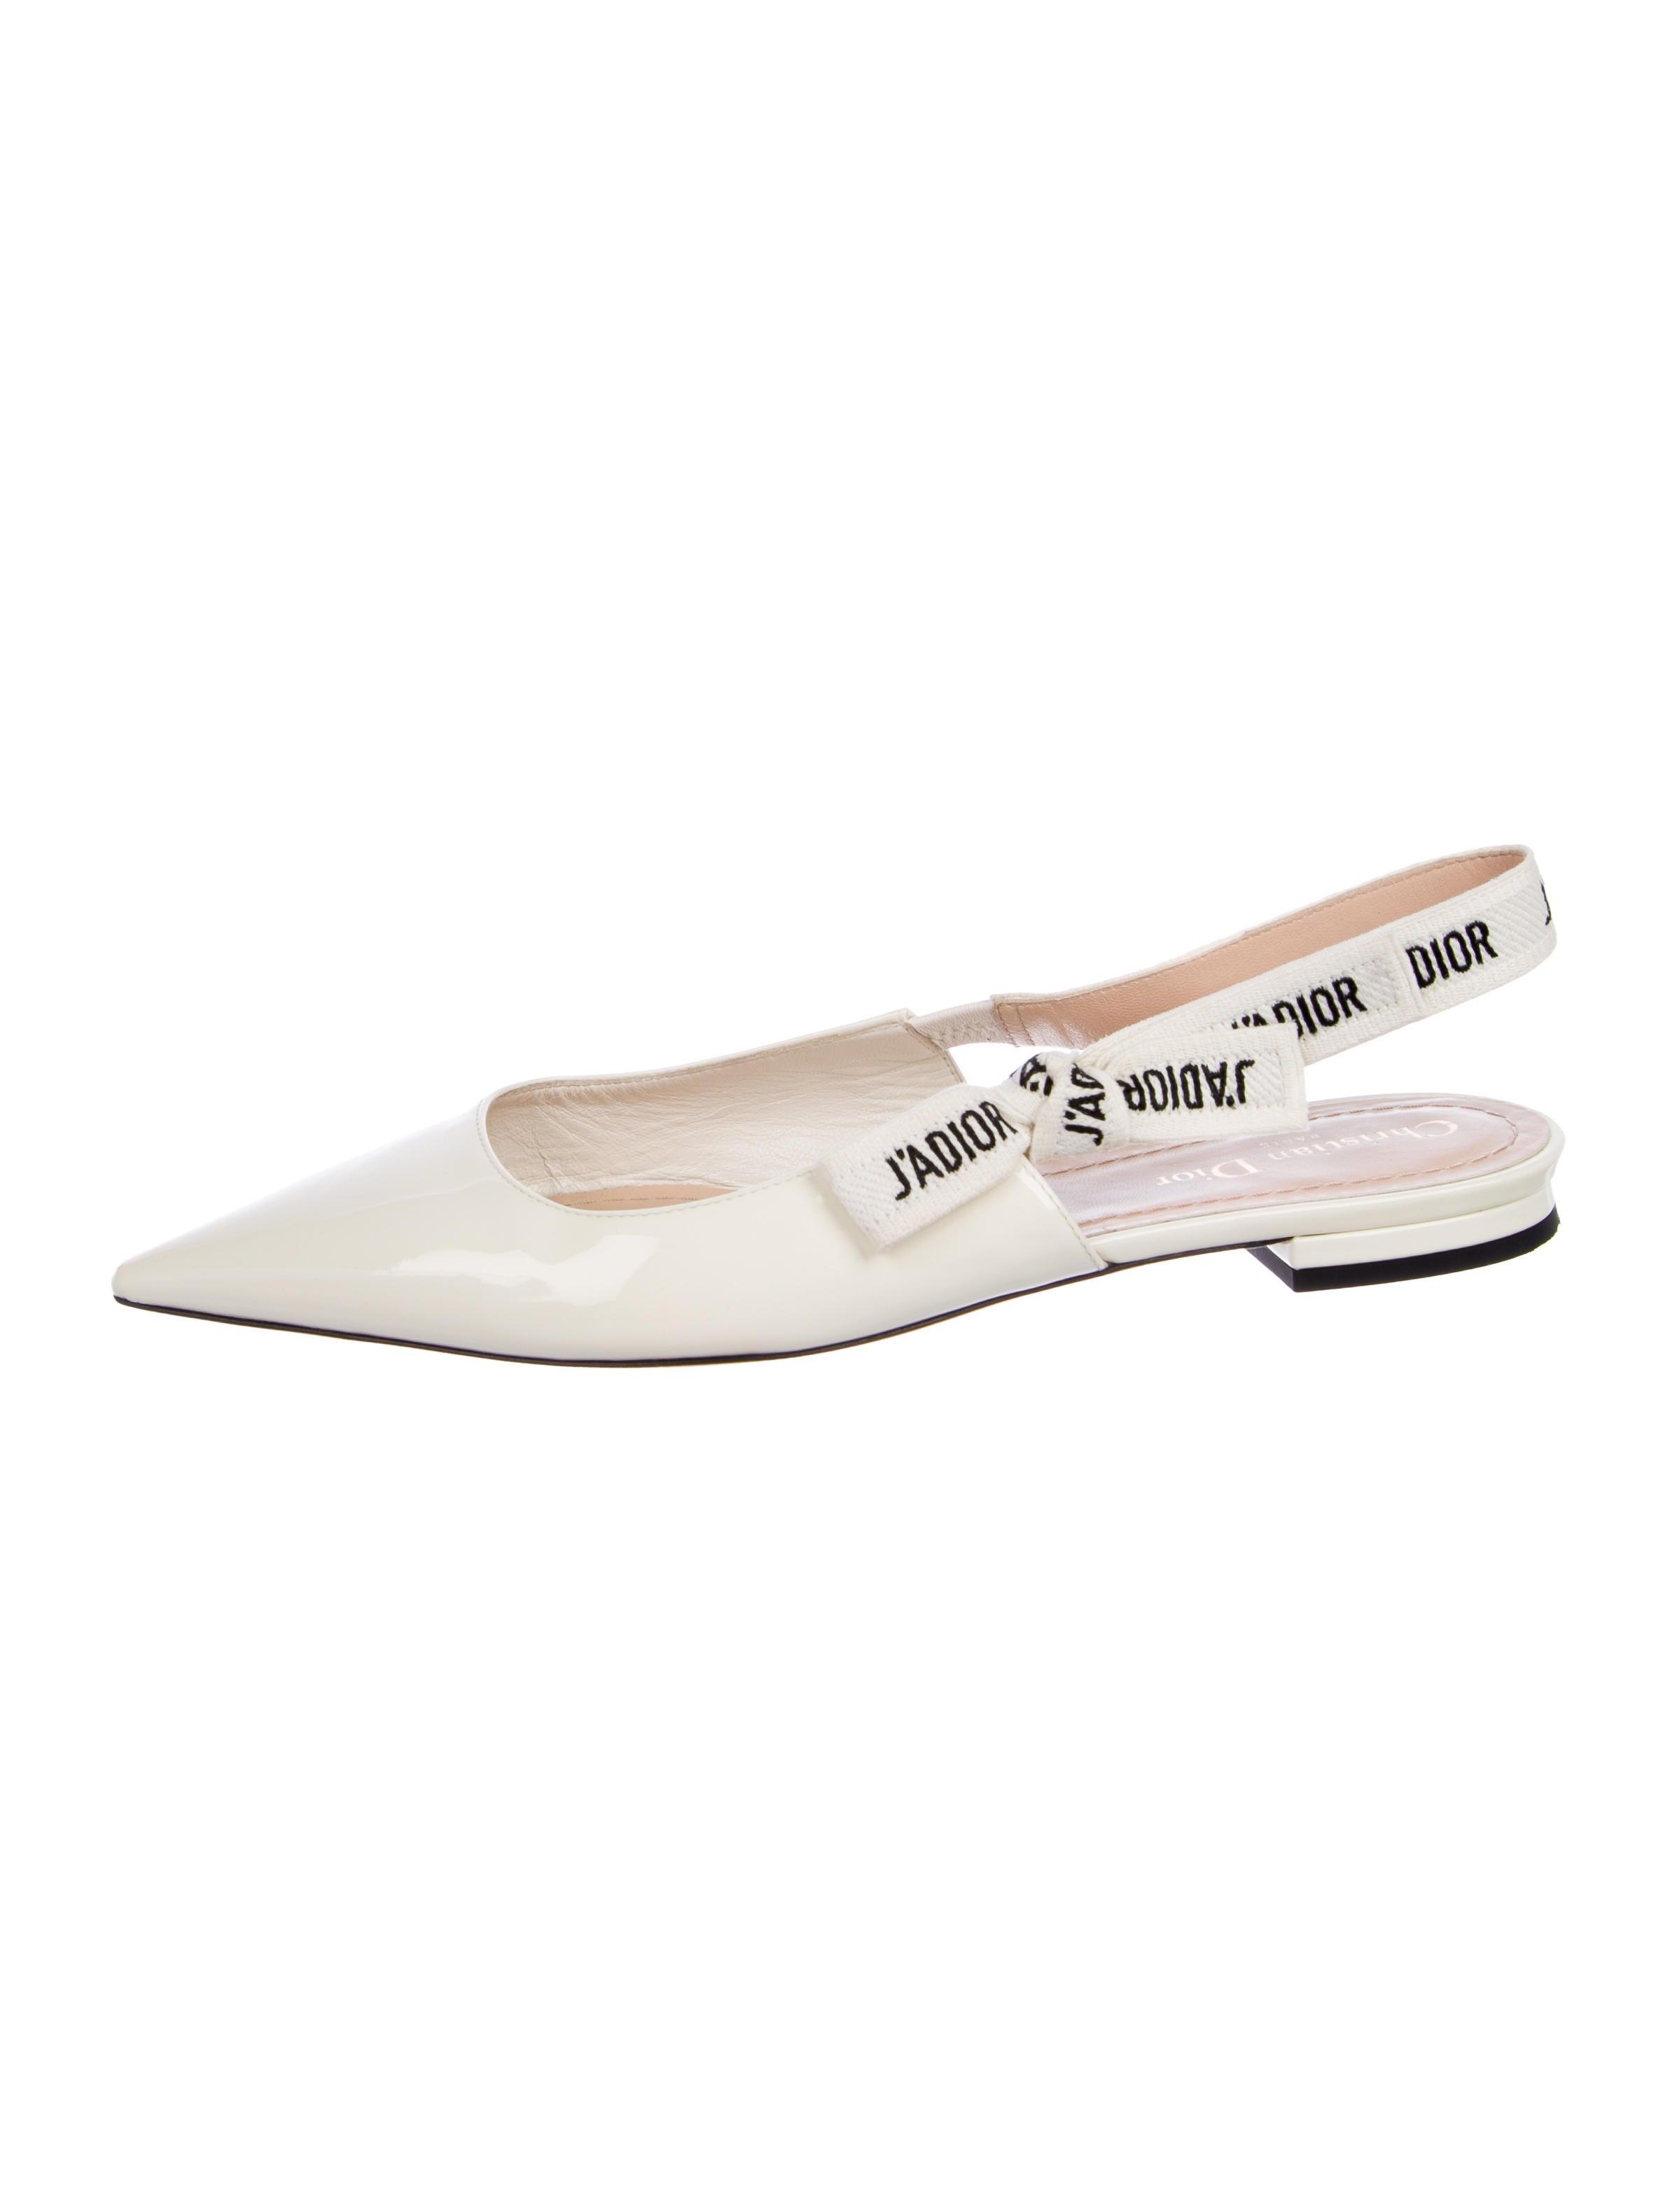 a2581de815 Christian Dior J'Adior Slingback Flats - Shoes - CHR78898 | The RealReal